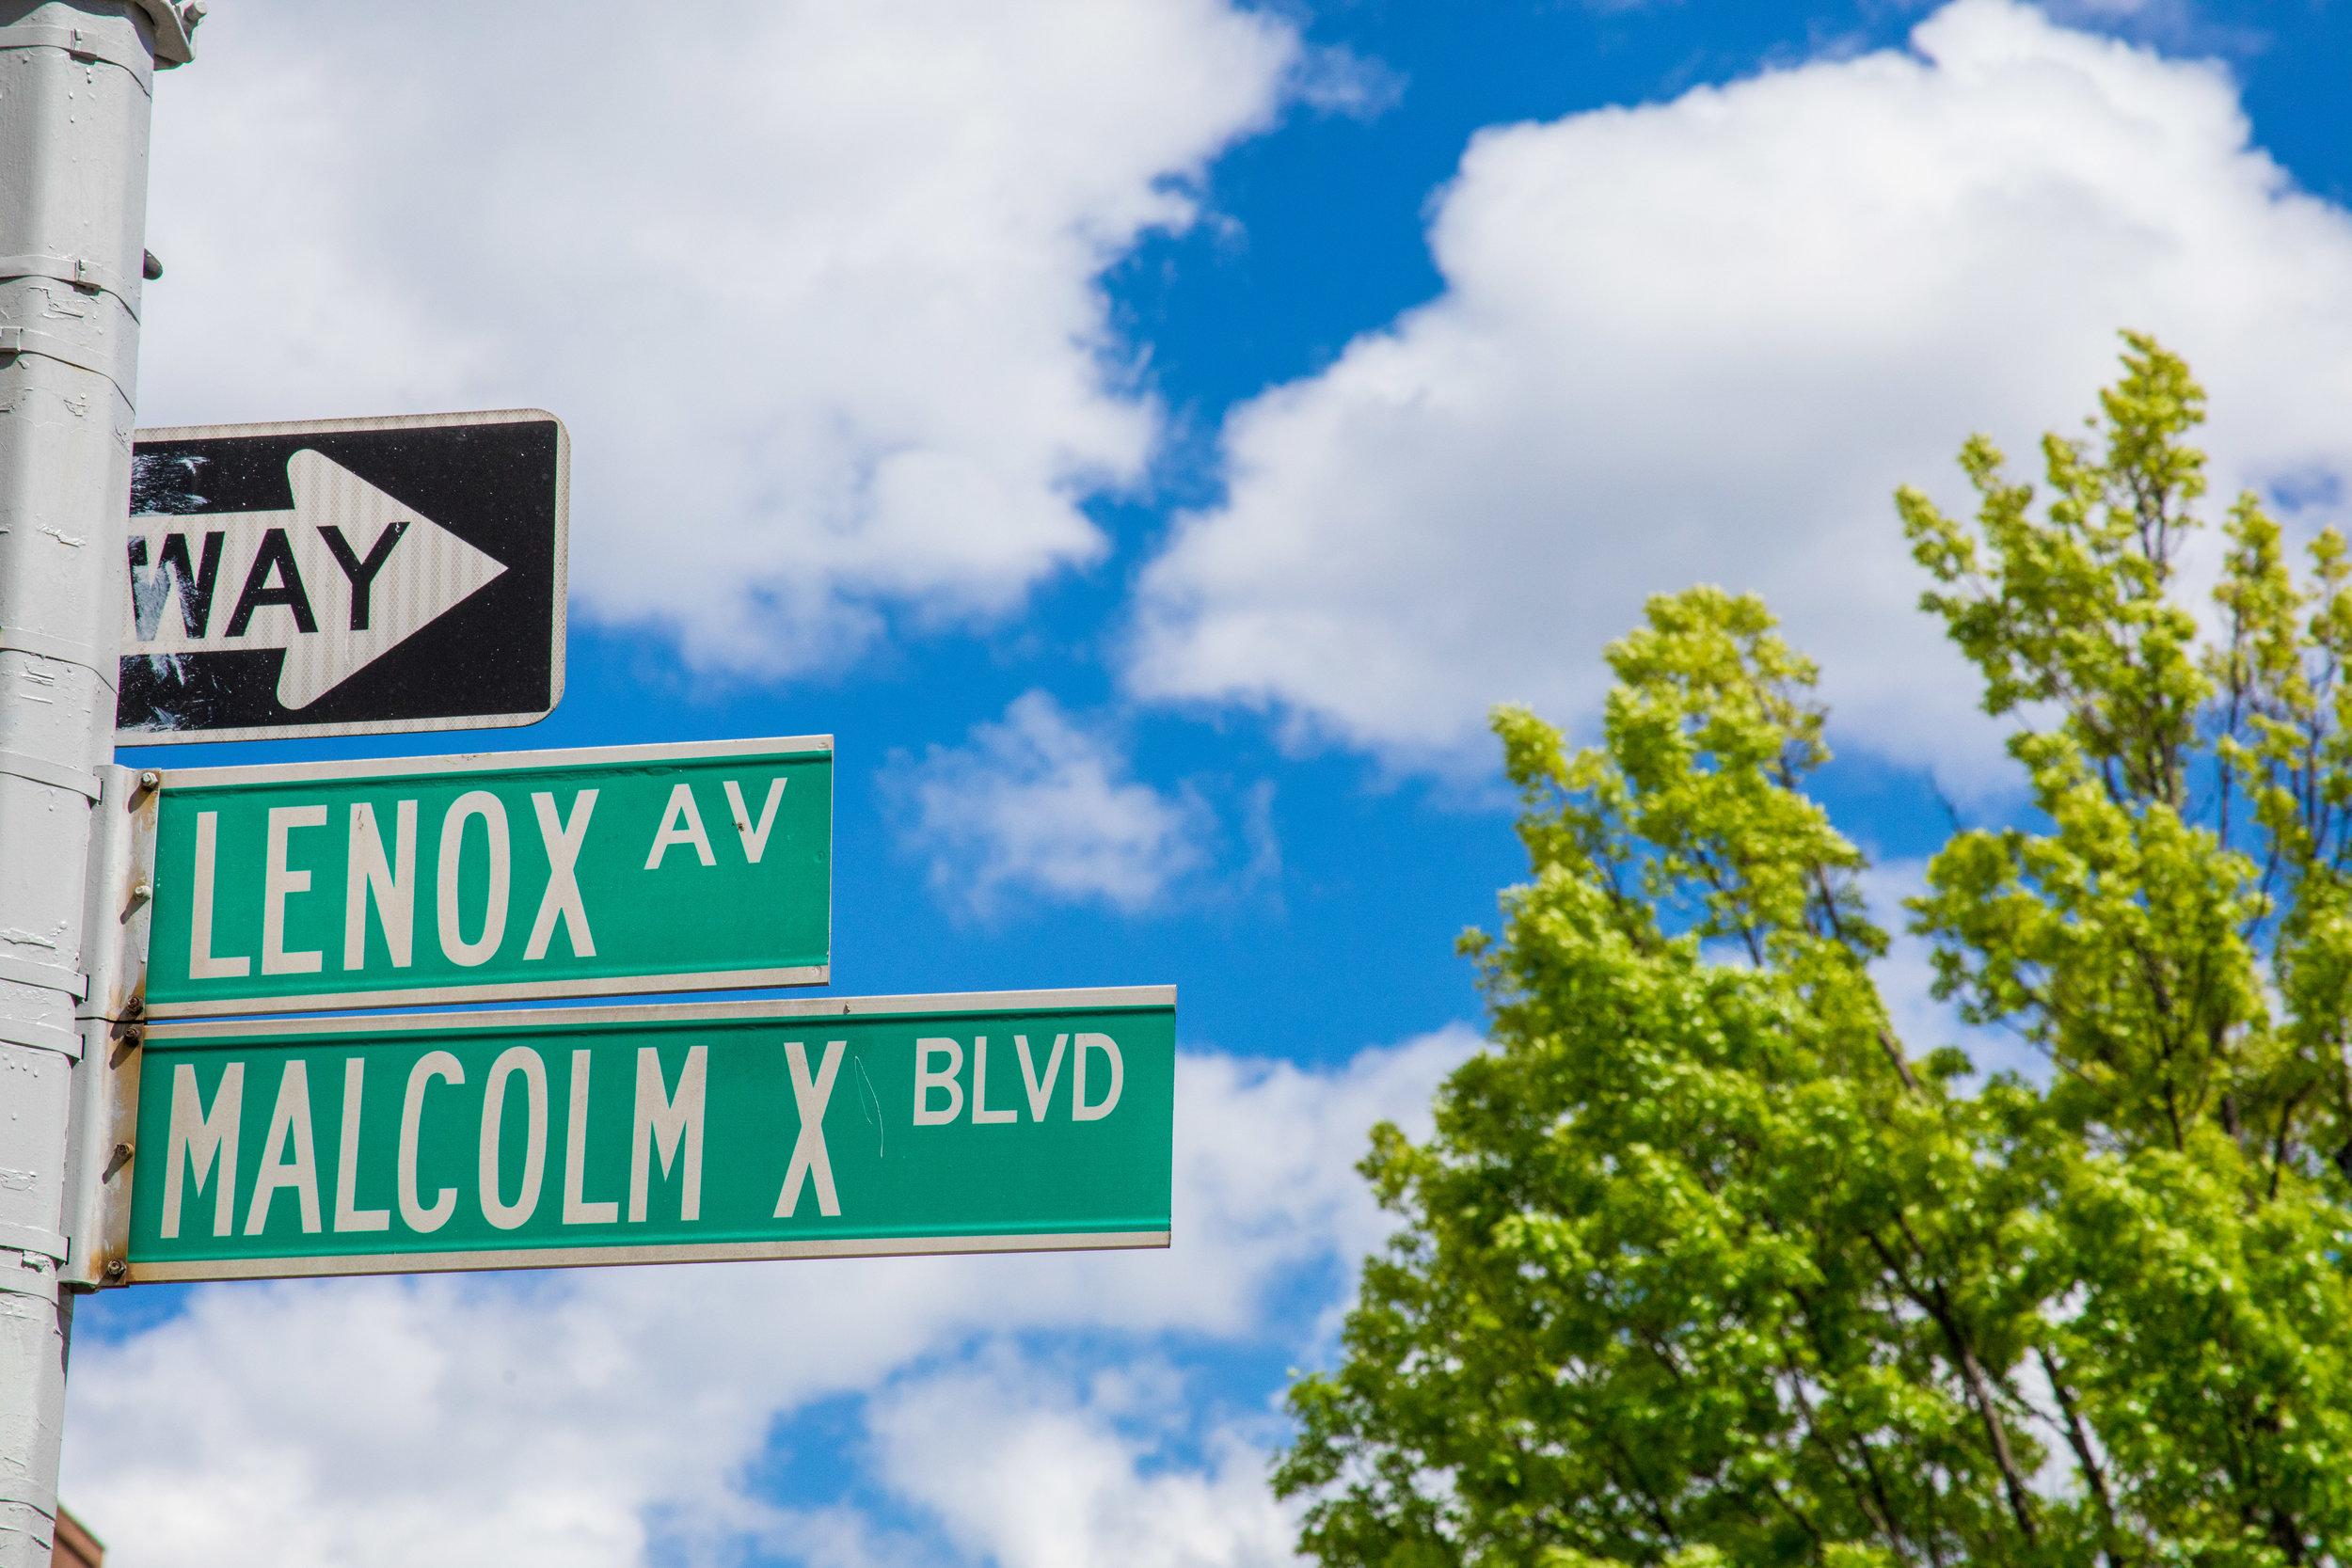 LSNY_Harlem-66.jpg